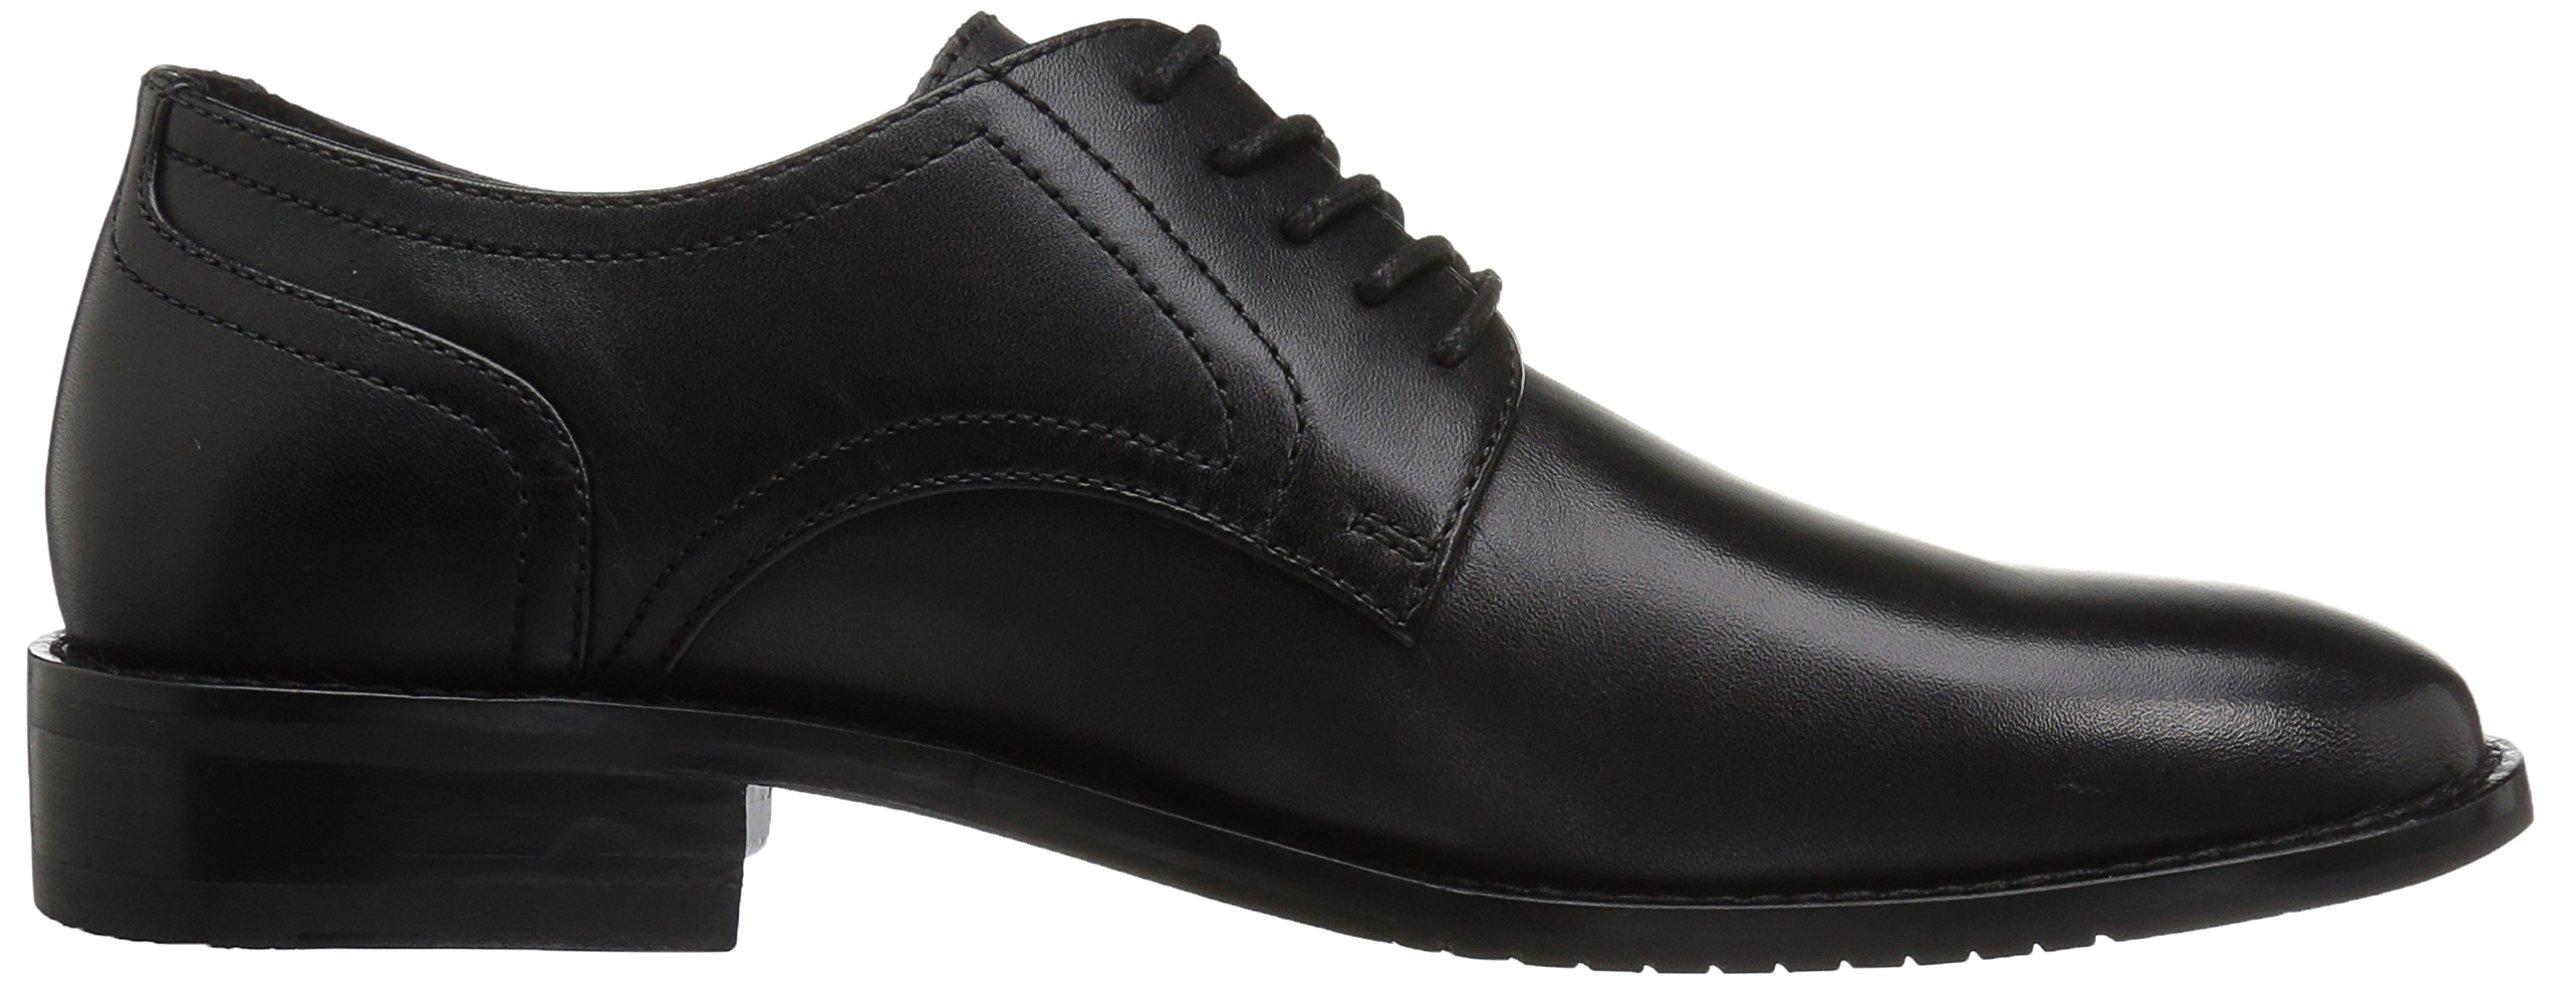 206 Collective Men's Concord Plain-Toe Oxford Shoe, Black, 13 2E US by 206 Collective (Image #7)